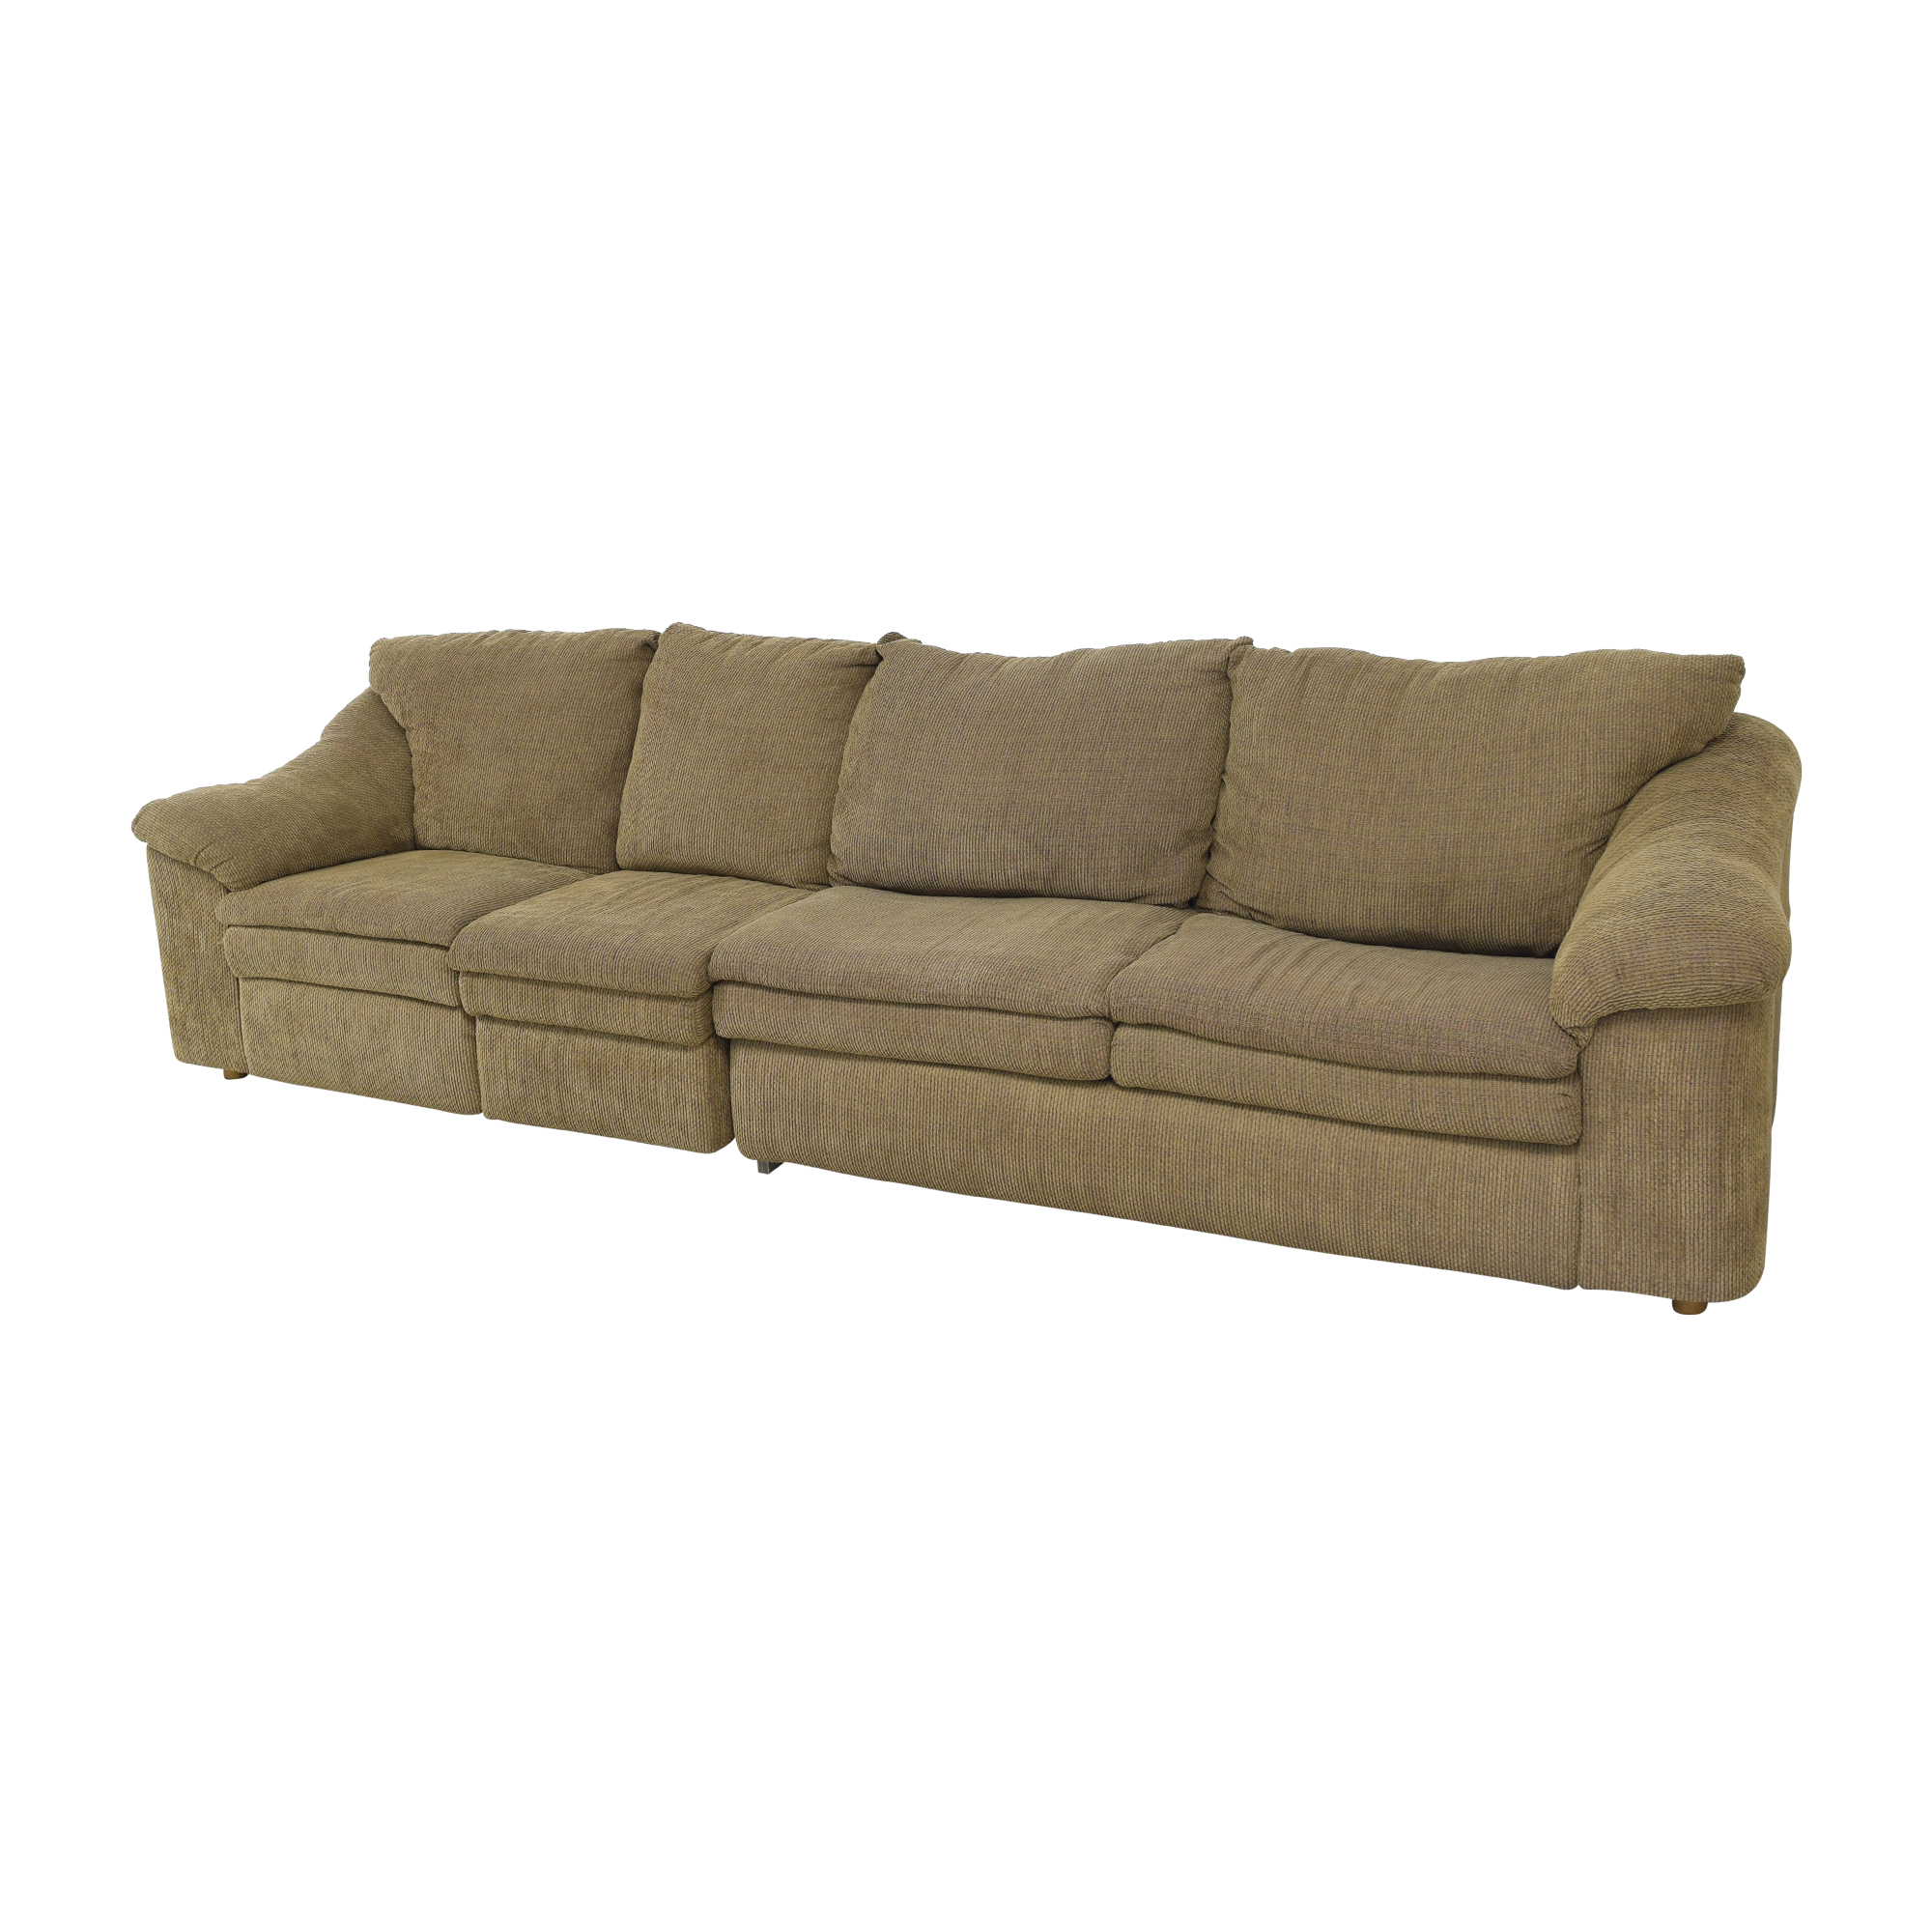 Raymour & Flanigan Raymour & Flanigan Sleeper Sofa with Ottoman price